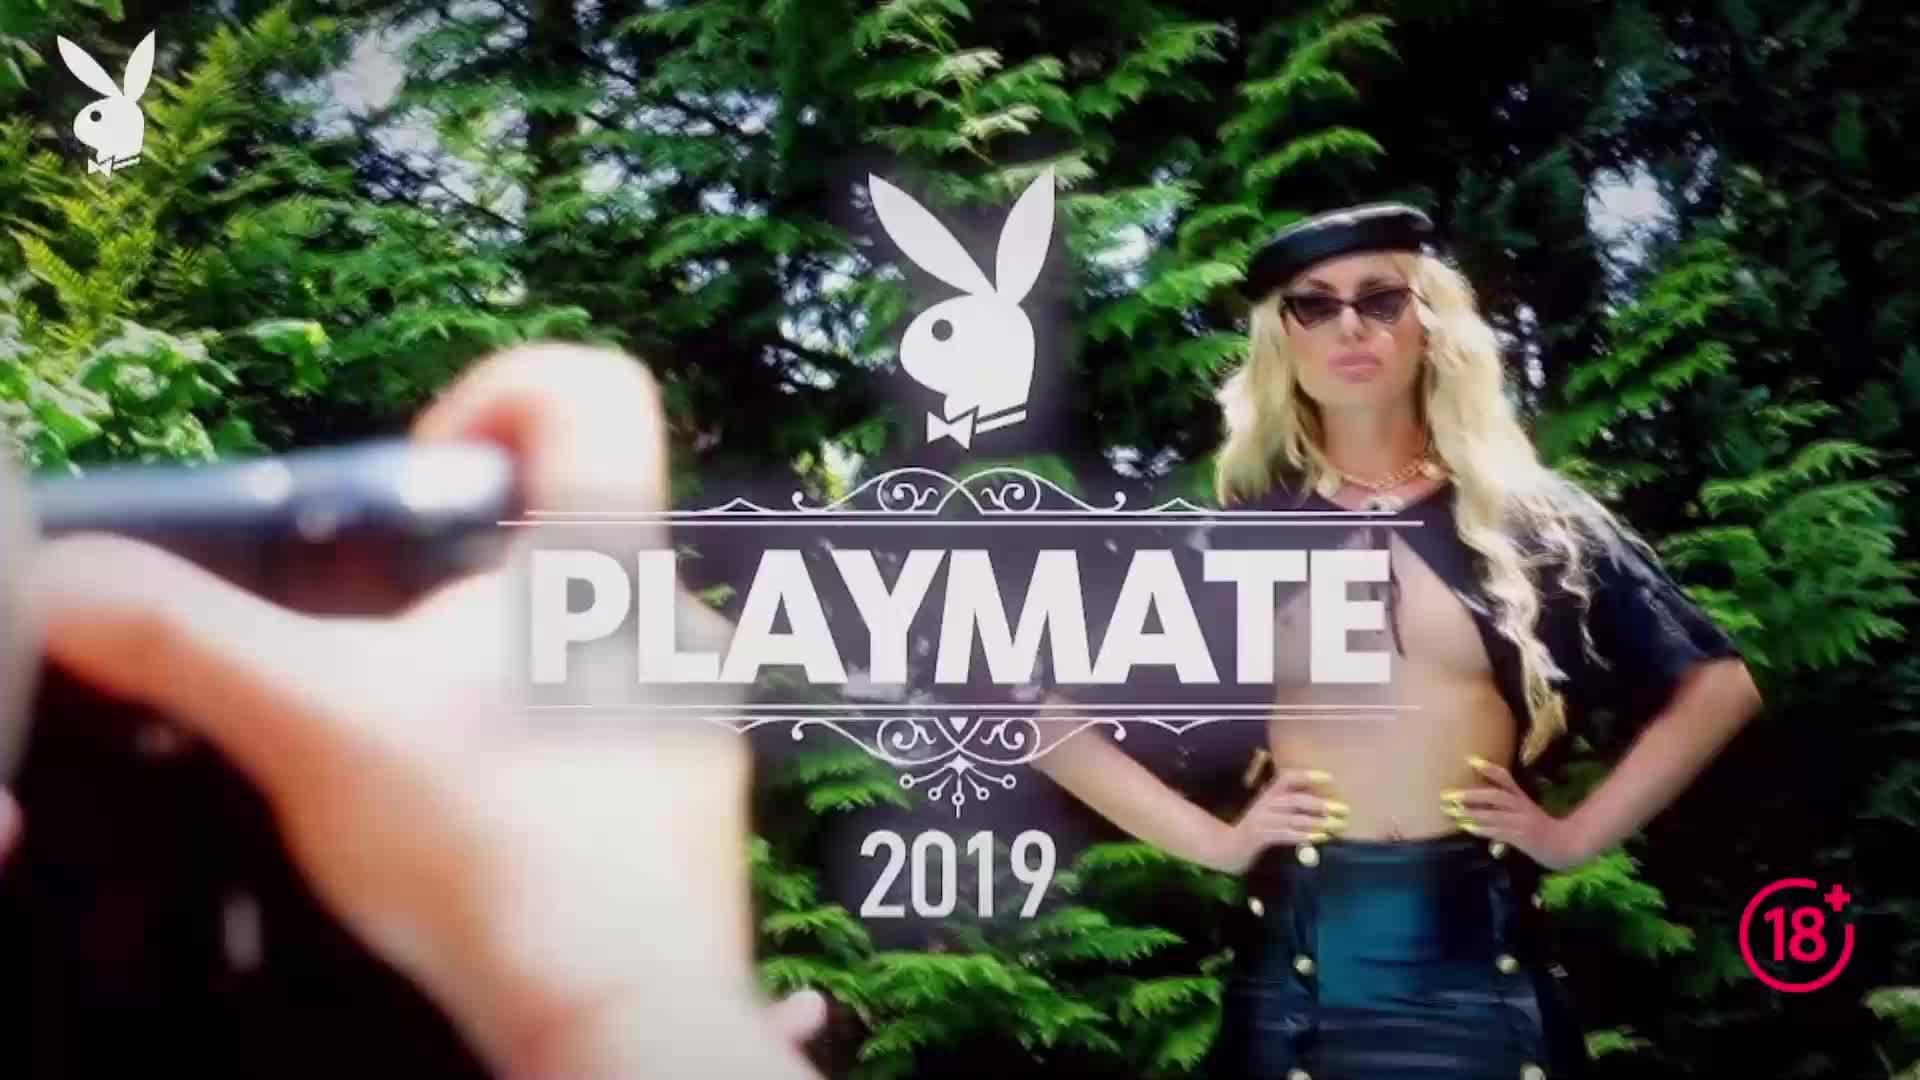 Янита Гашина Playmate Of The Year 2019